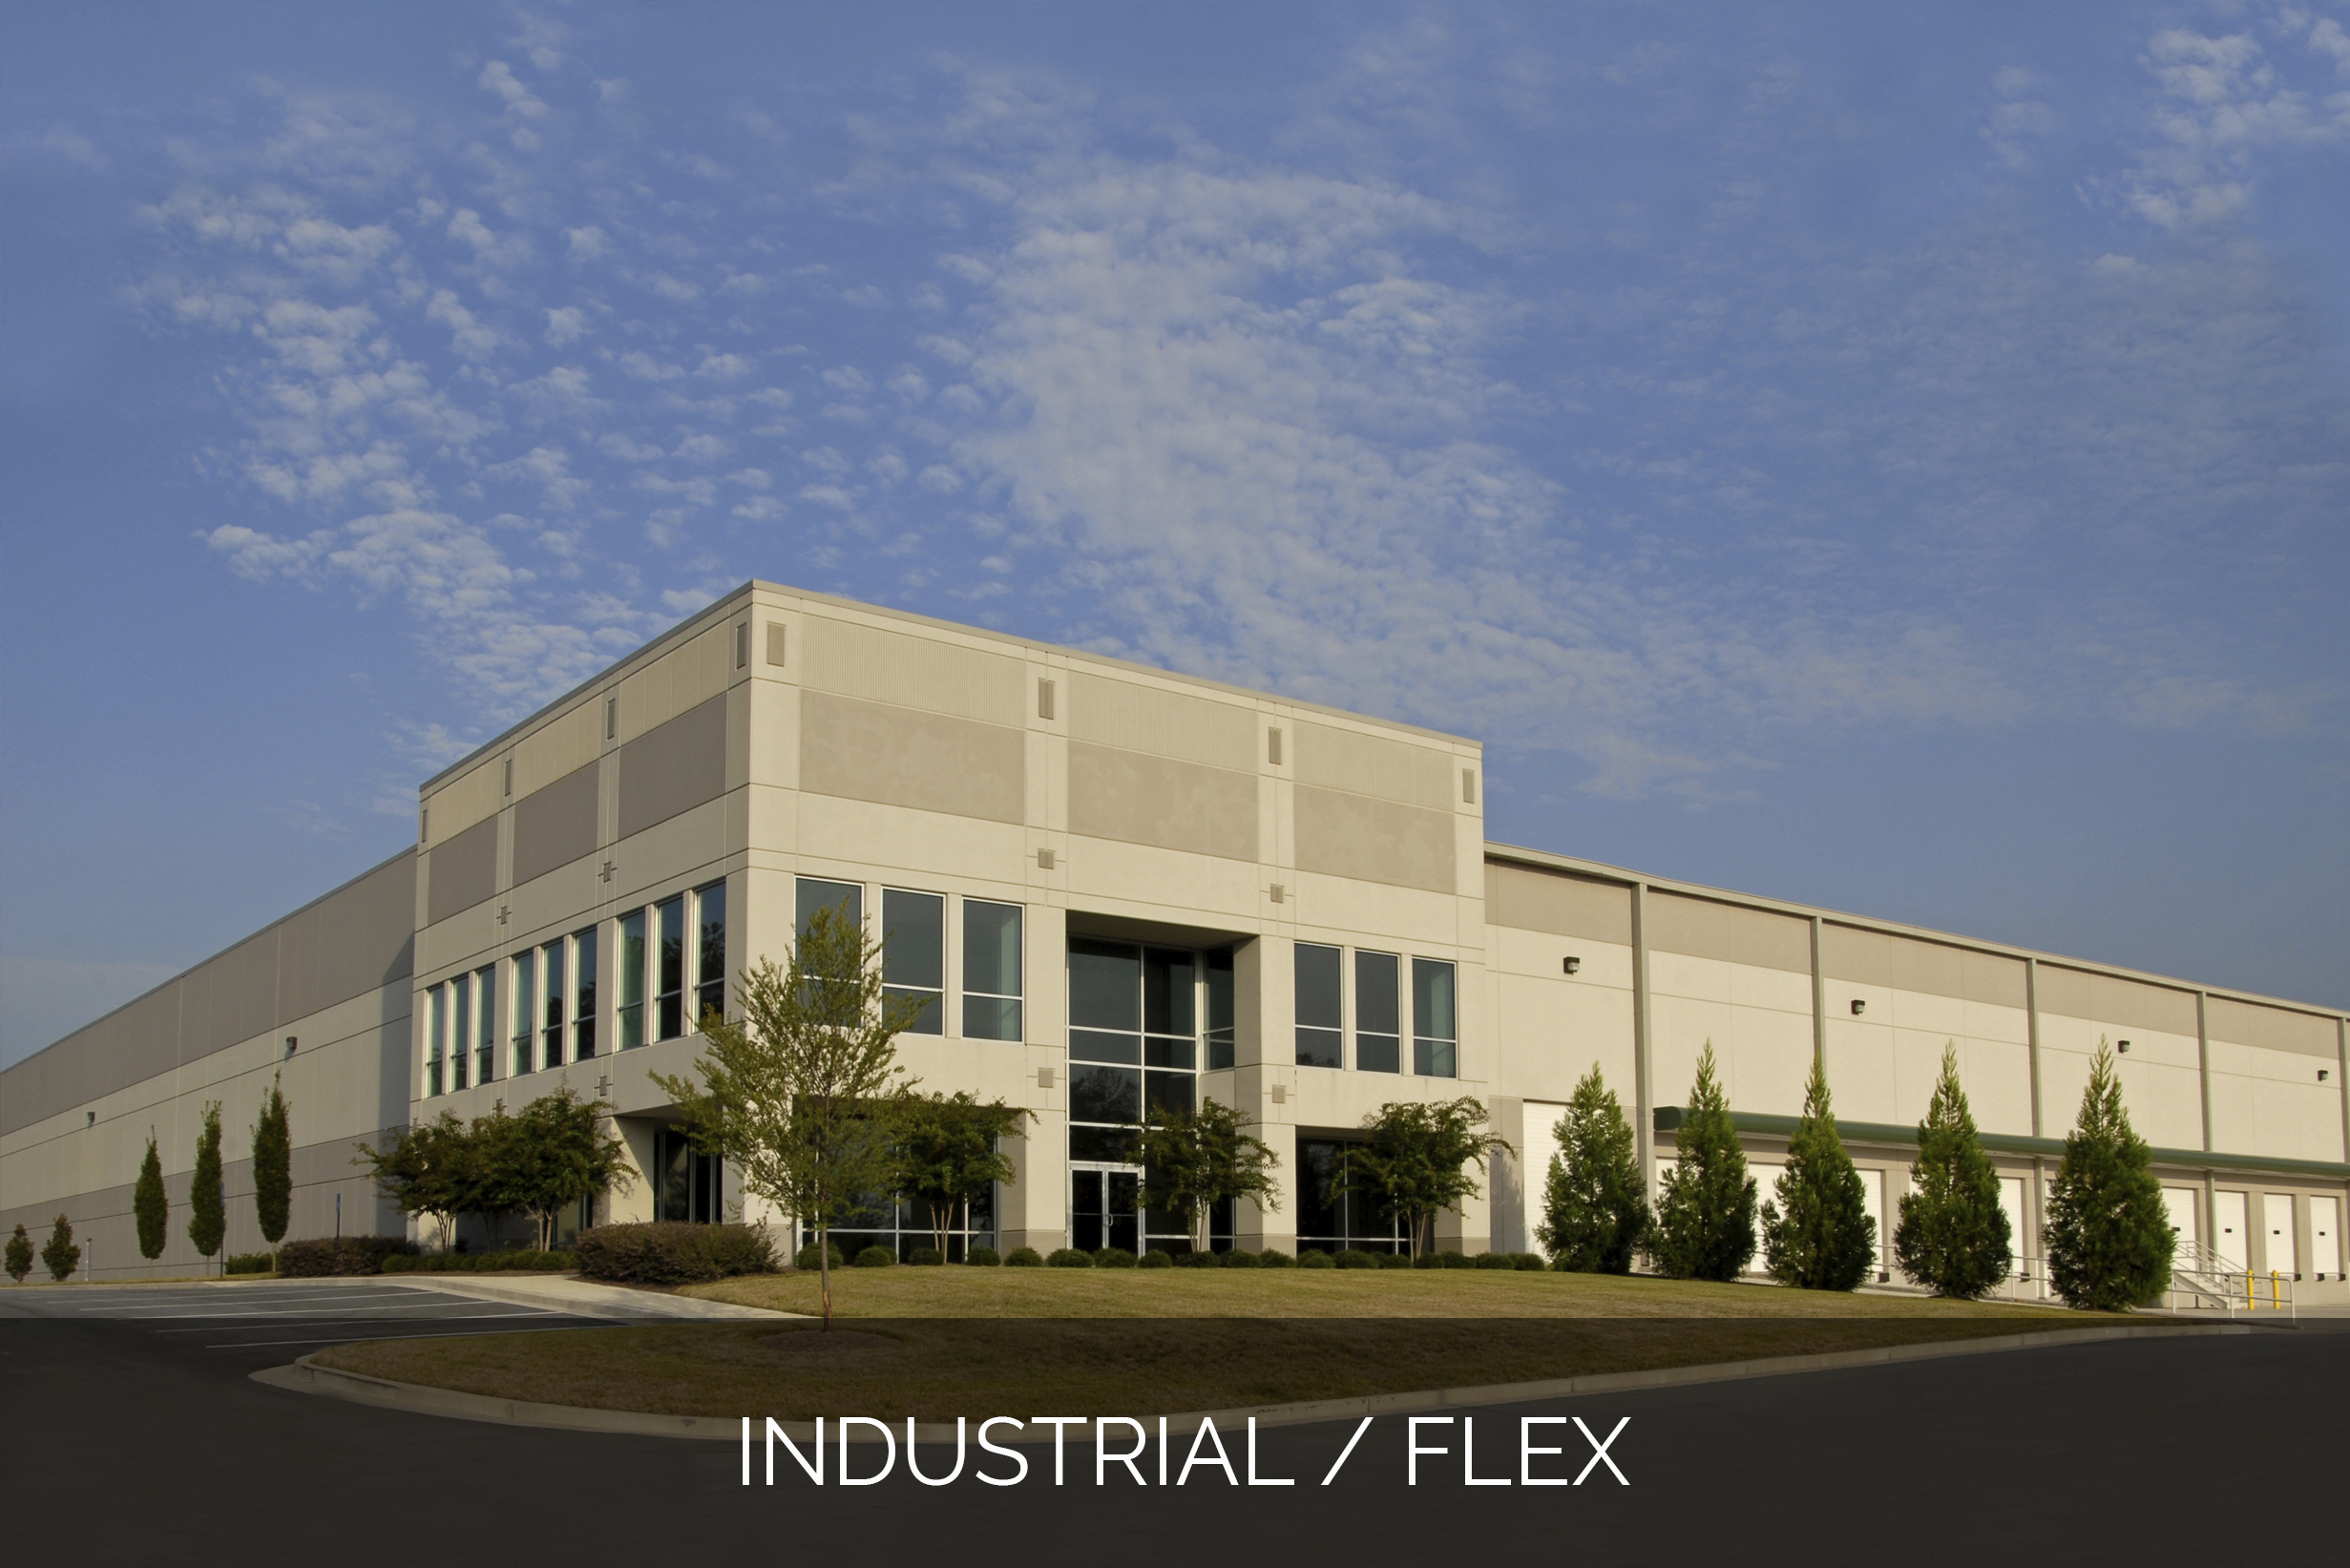 industrialflex-TEXT.jpg